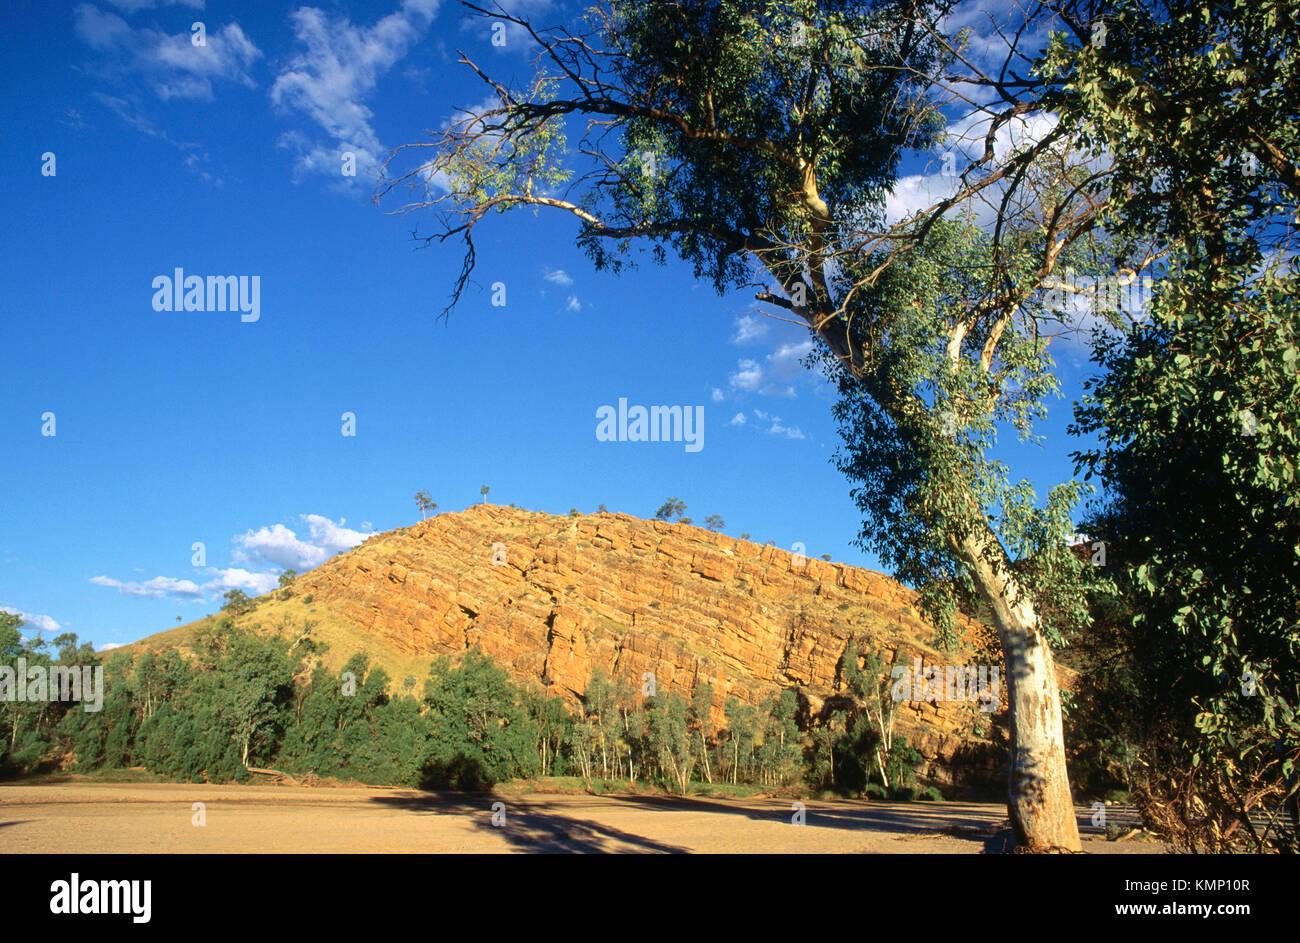 MacDonnell Ranges. Australia - Stock Image